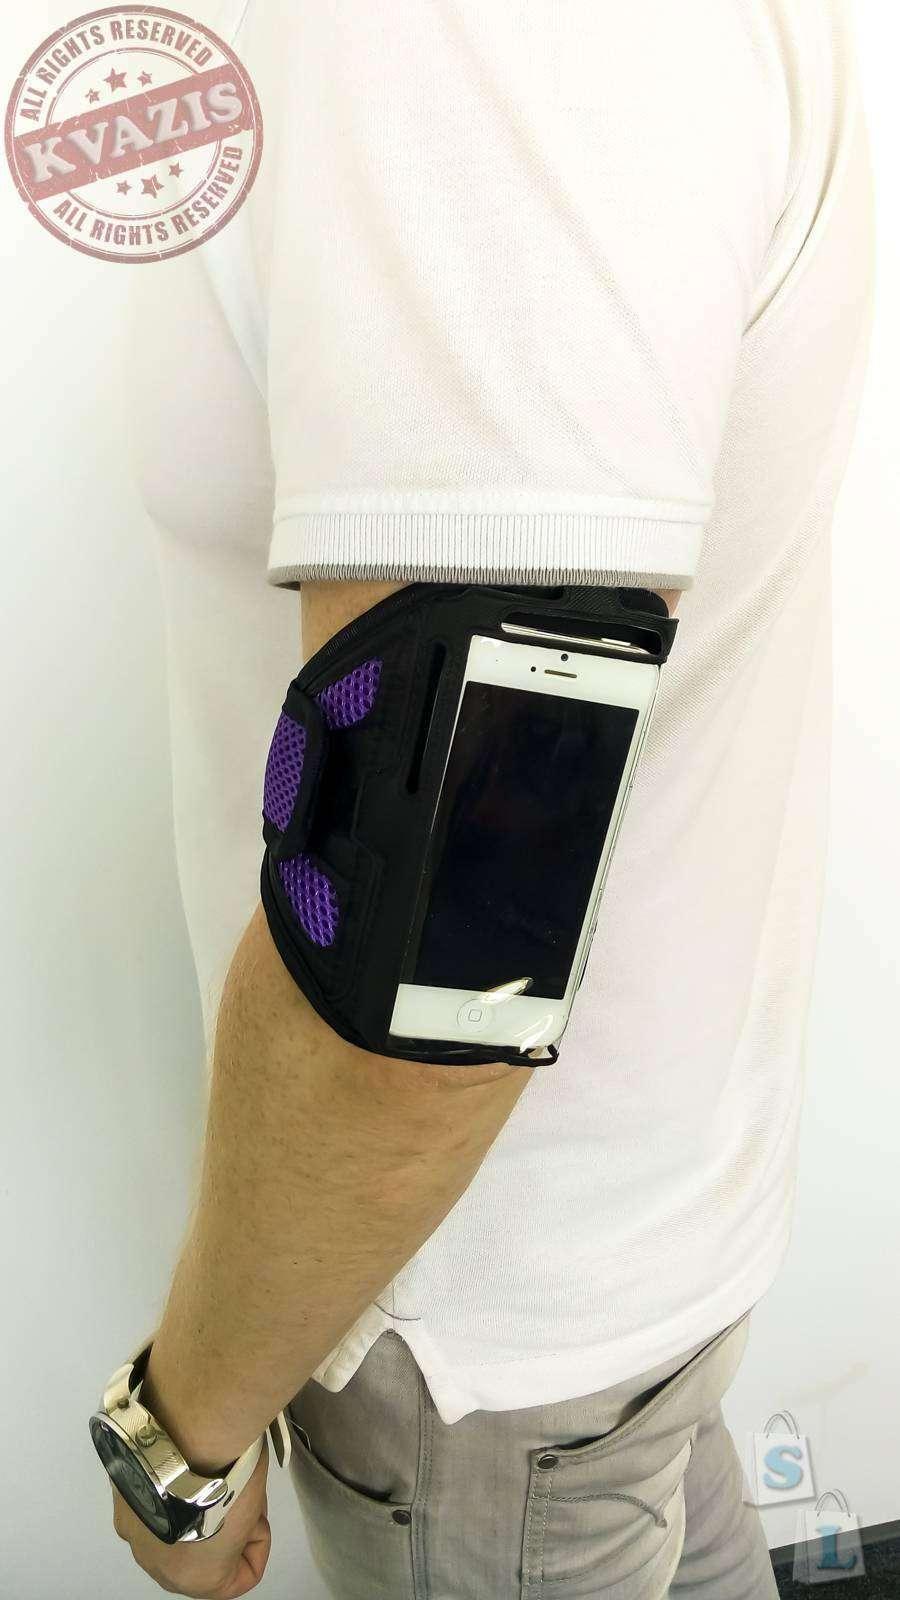 DD4: Спортивный чехол на руку для Iphone 5